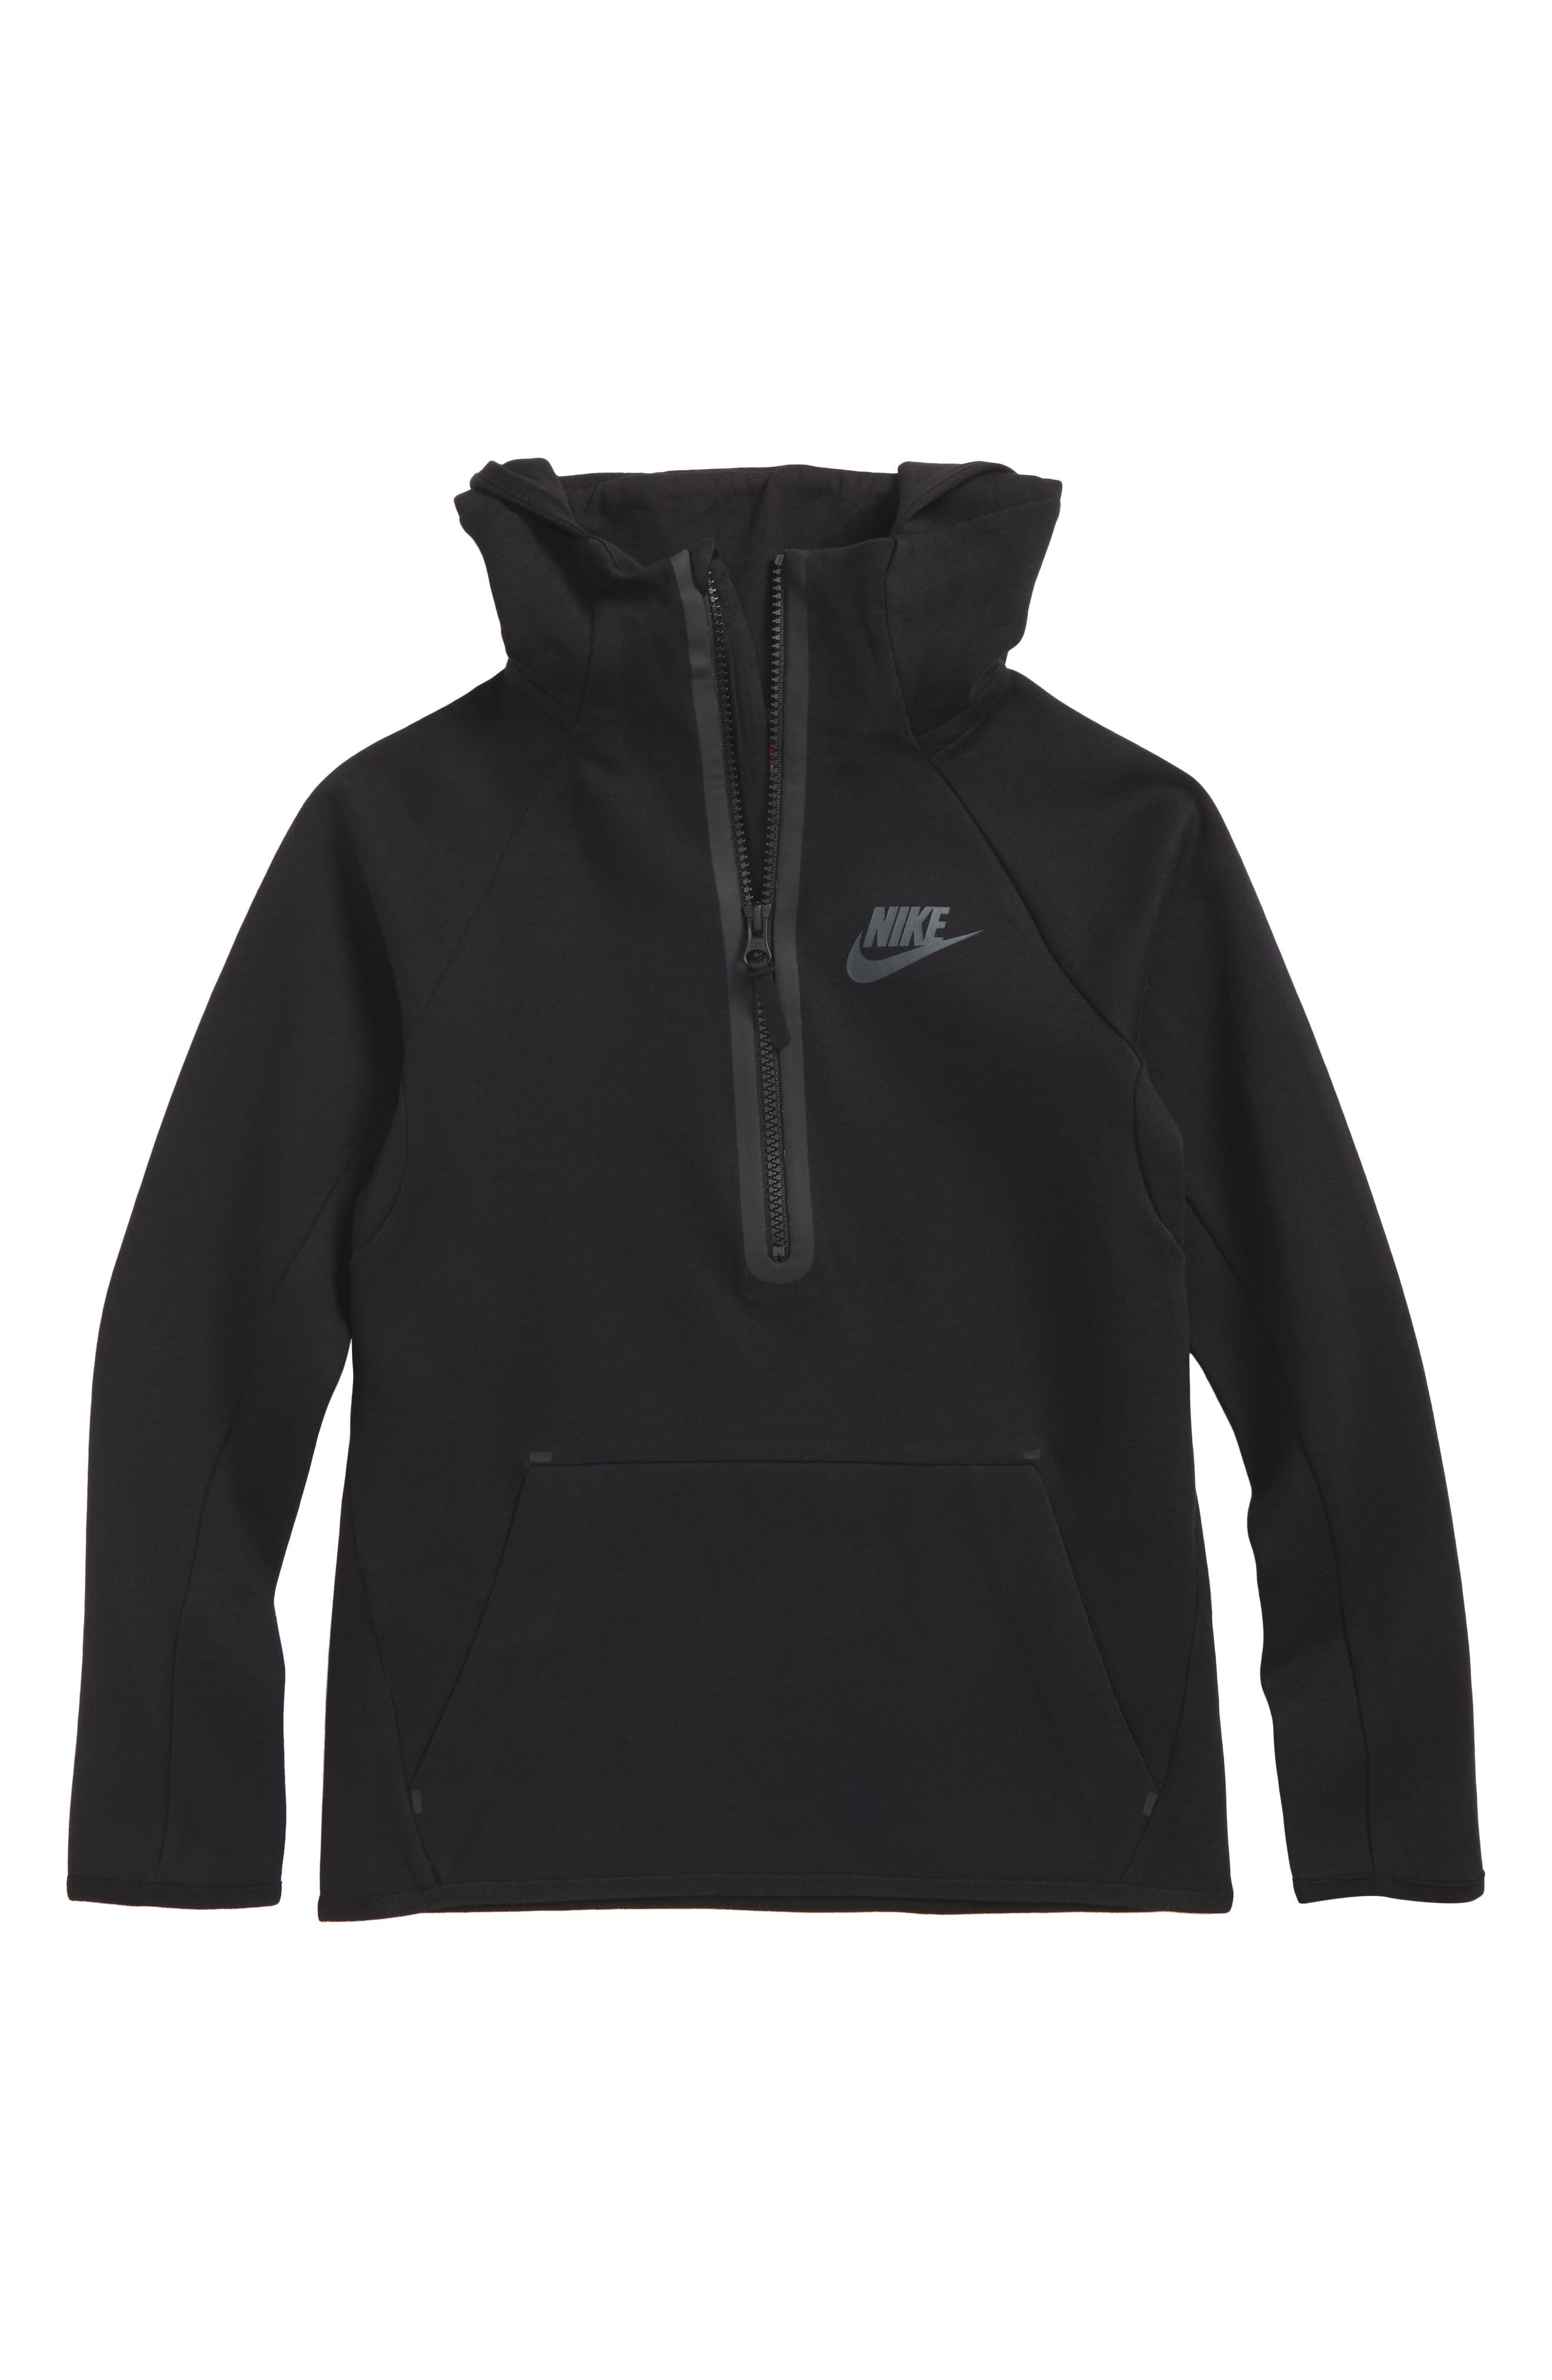 Alternate Image 1 Selected - Nike Sportswear Tech Quarter Zip Hoodie (Little Boys & Big Boys)